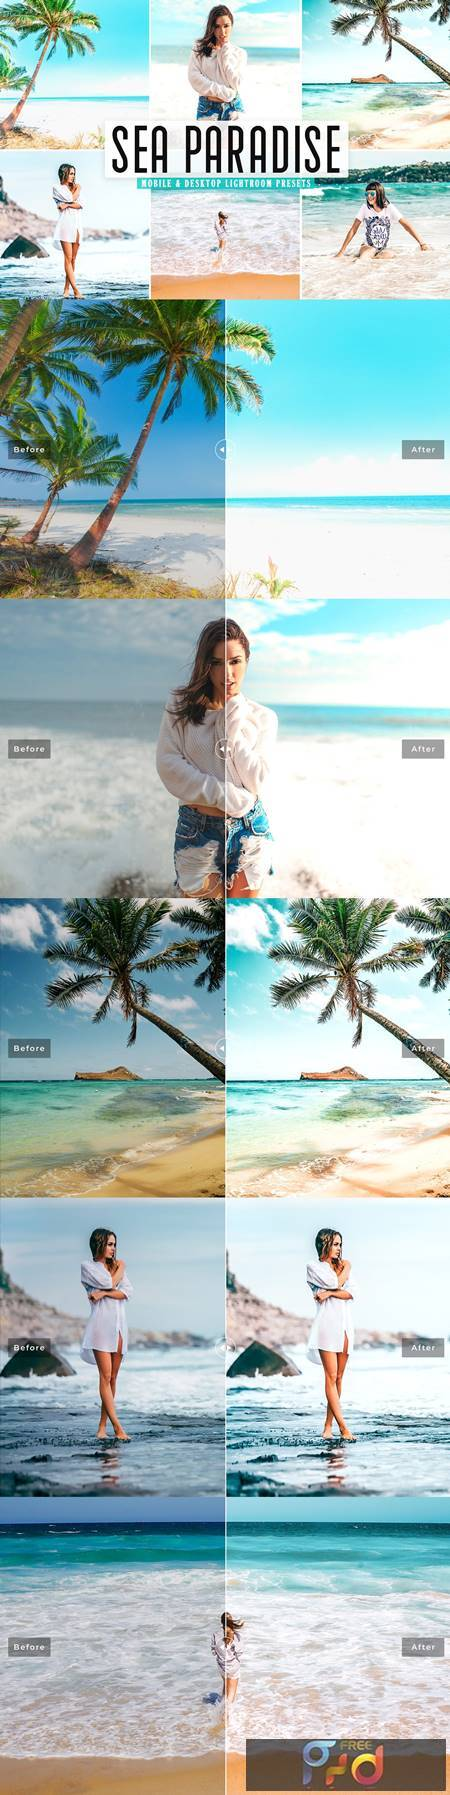 Sea Paradise Mobile & Desktop Lightroom Presets 5437511 1